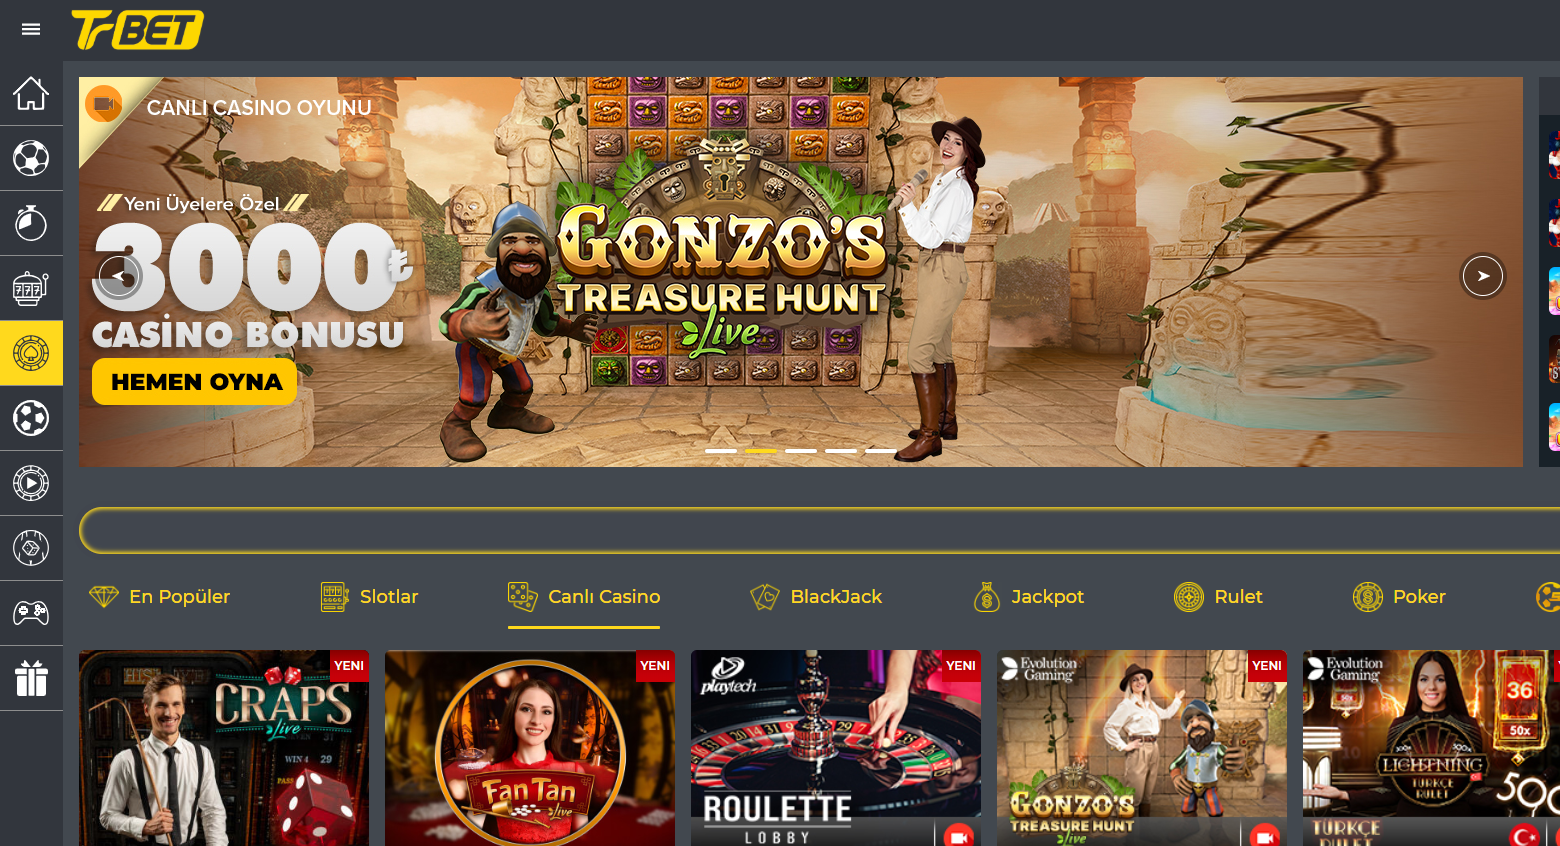 trbet canli casino oyunlari nelerdir